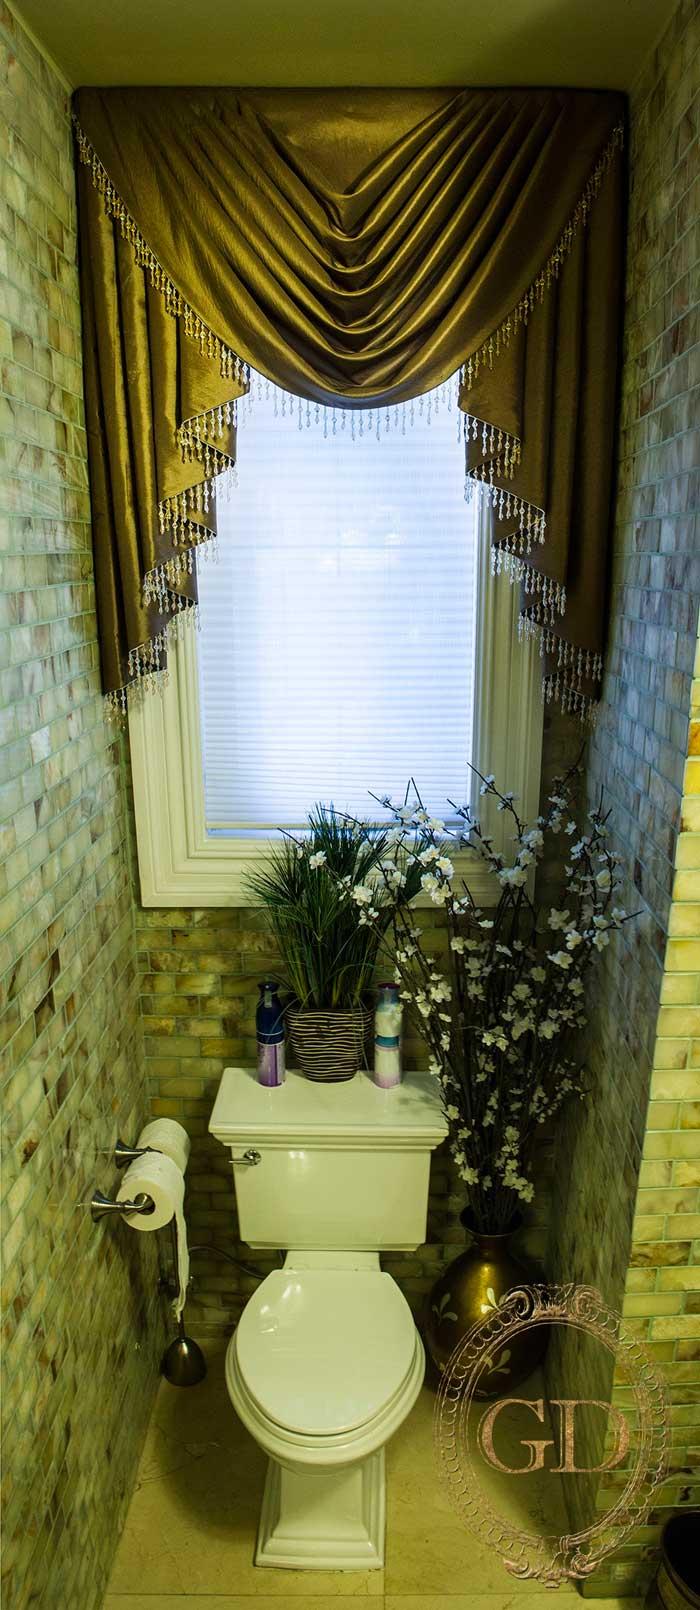 Valance For Bathroom Window Treatment Gallery Bergen County Nj